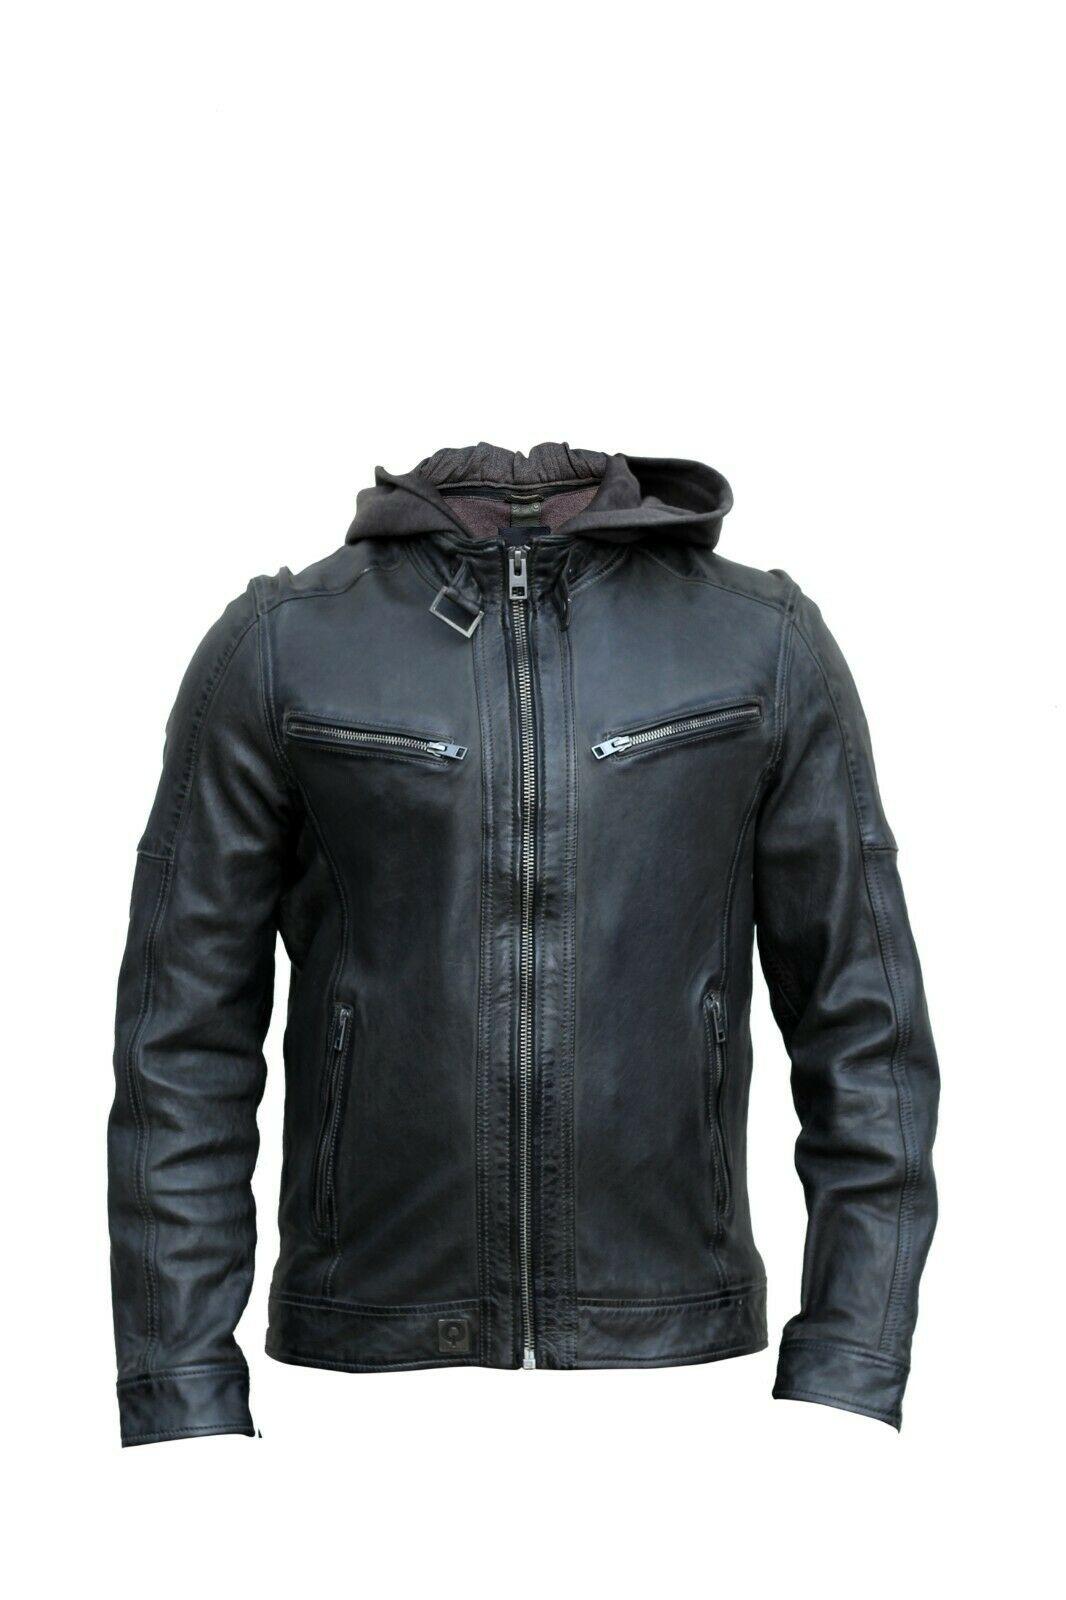 Men Navy Blue Sheep Leather Slim Fit Biker Jacket Casual Outwear LCM11